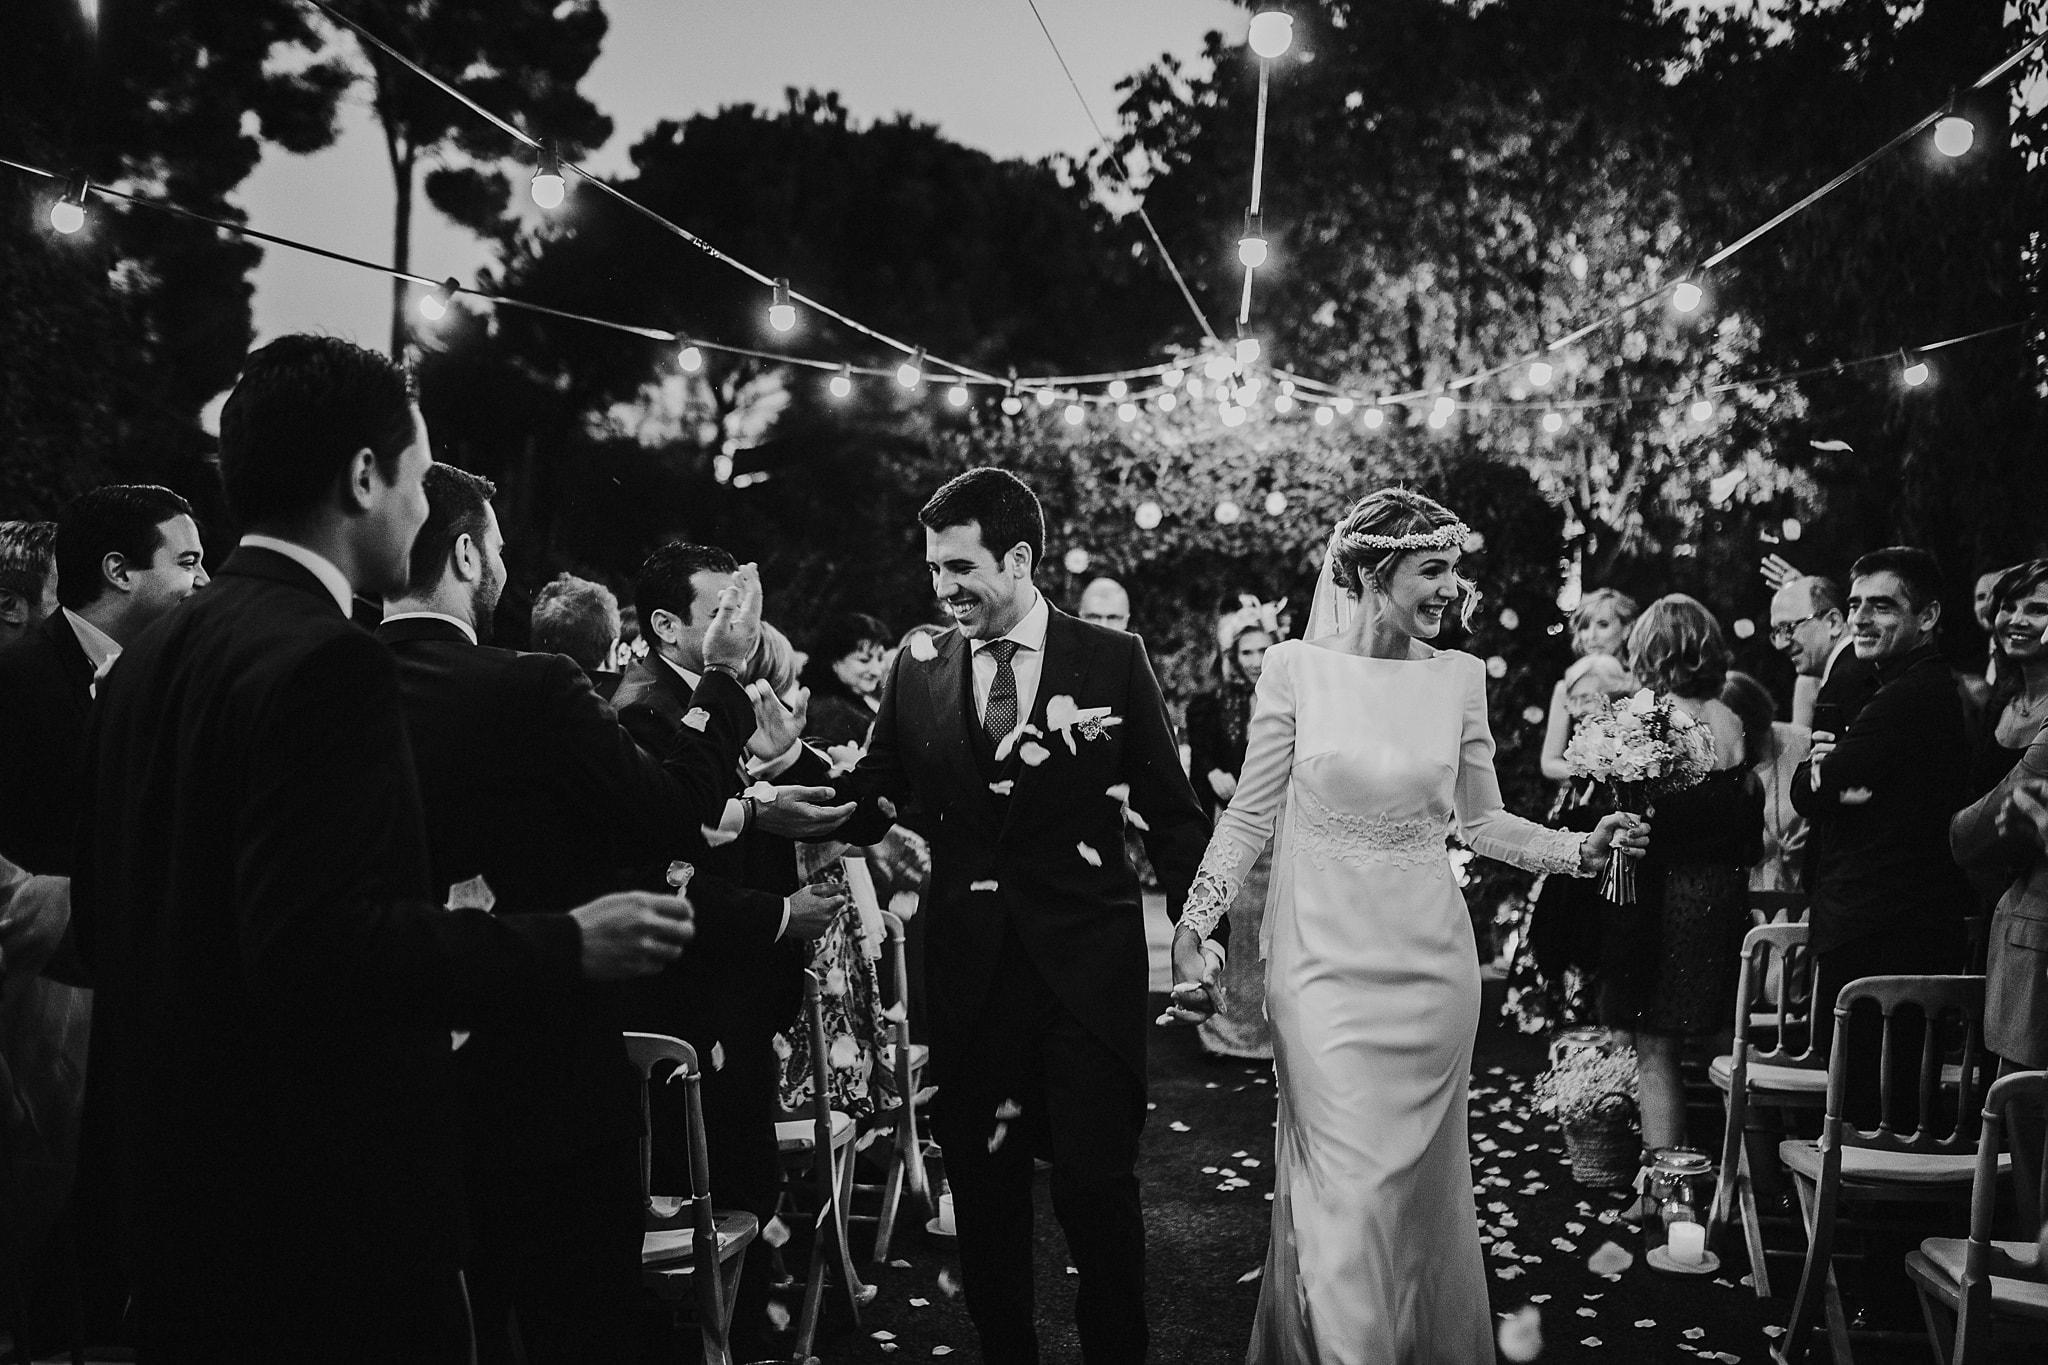 prisma-blanco-fotografos-bodas-toledo-135